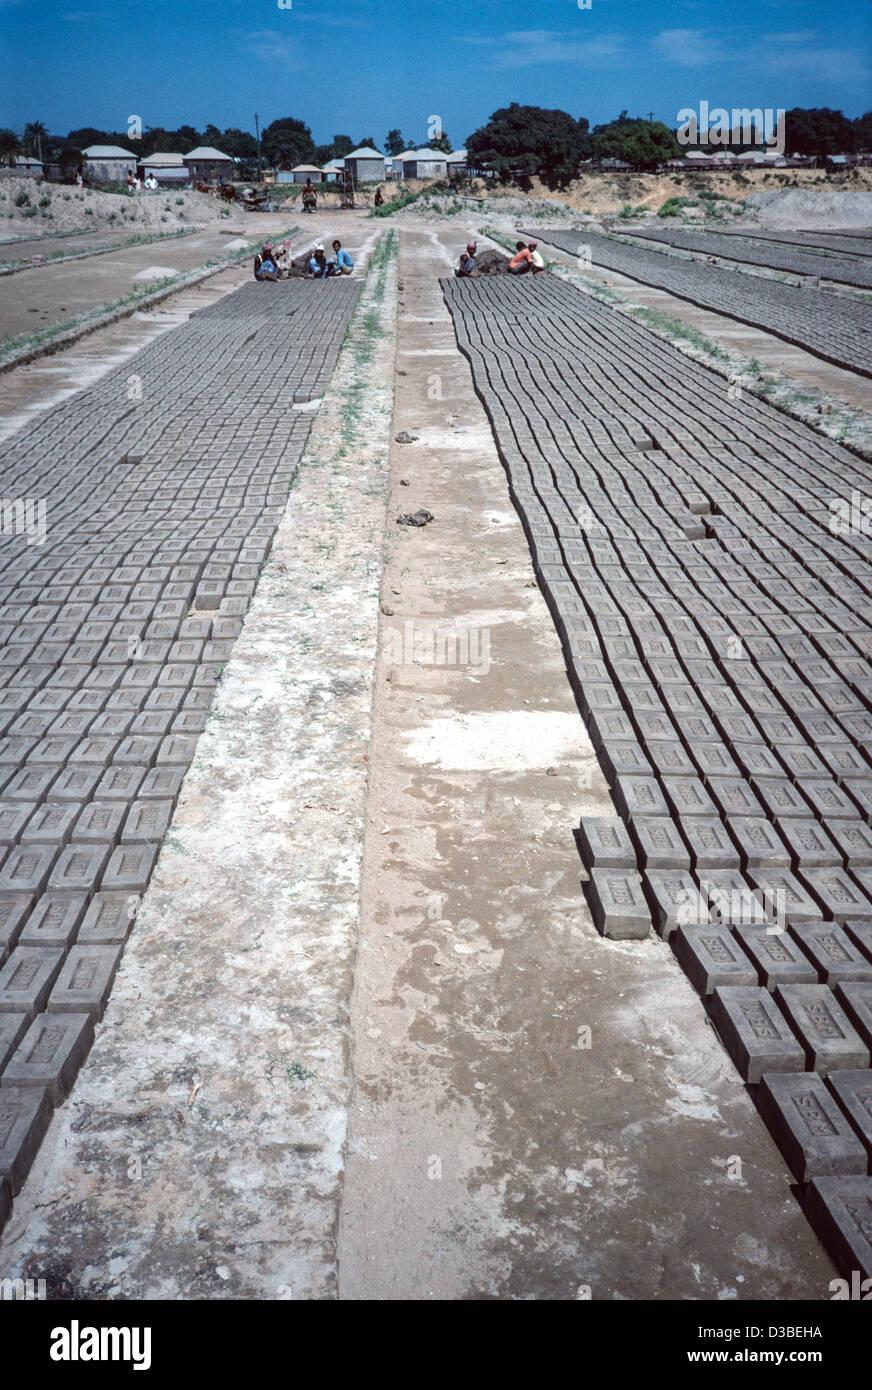 Bricks drying in the sun at a brickyard. Tangail District, Bangladesh - Stock Image